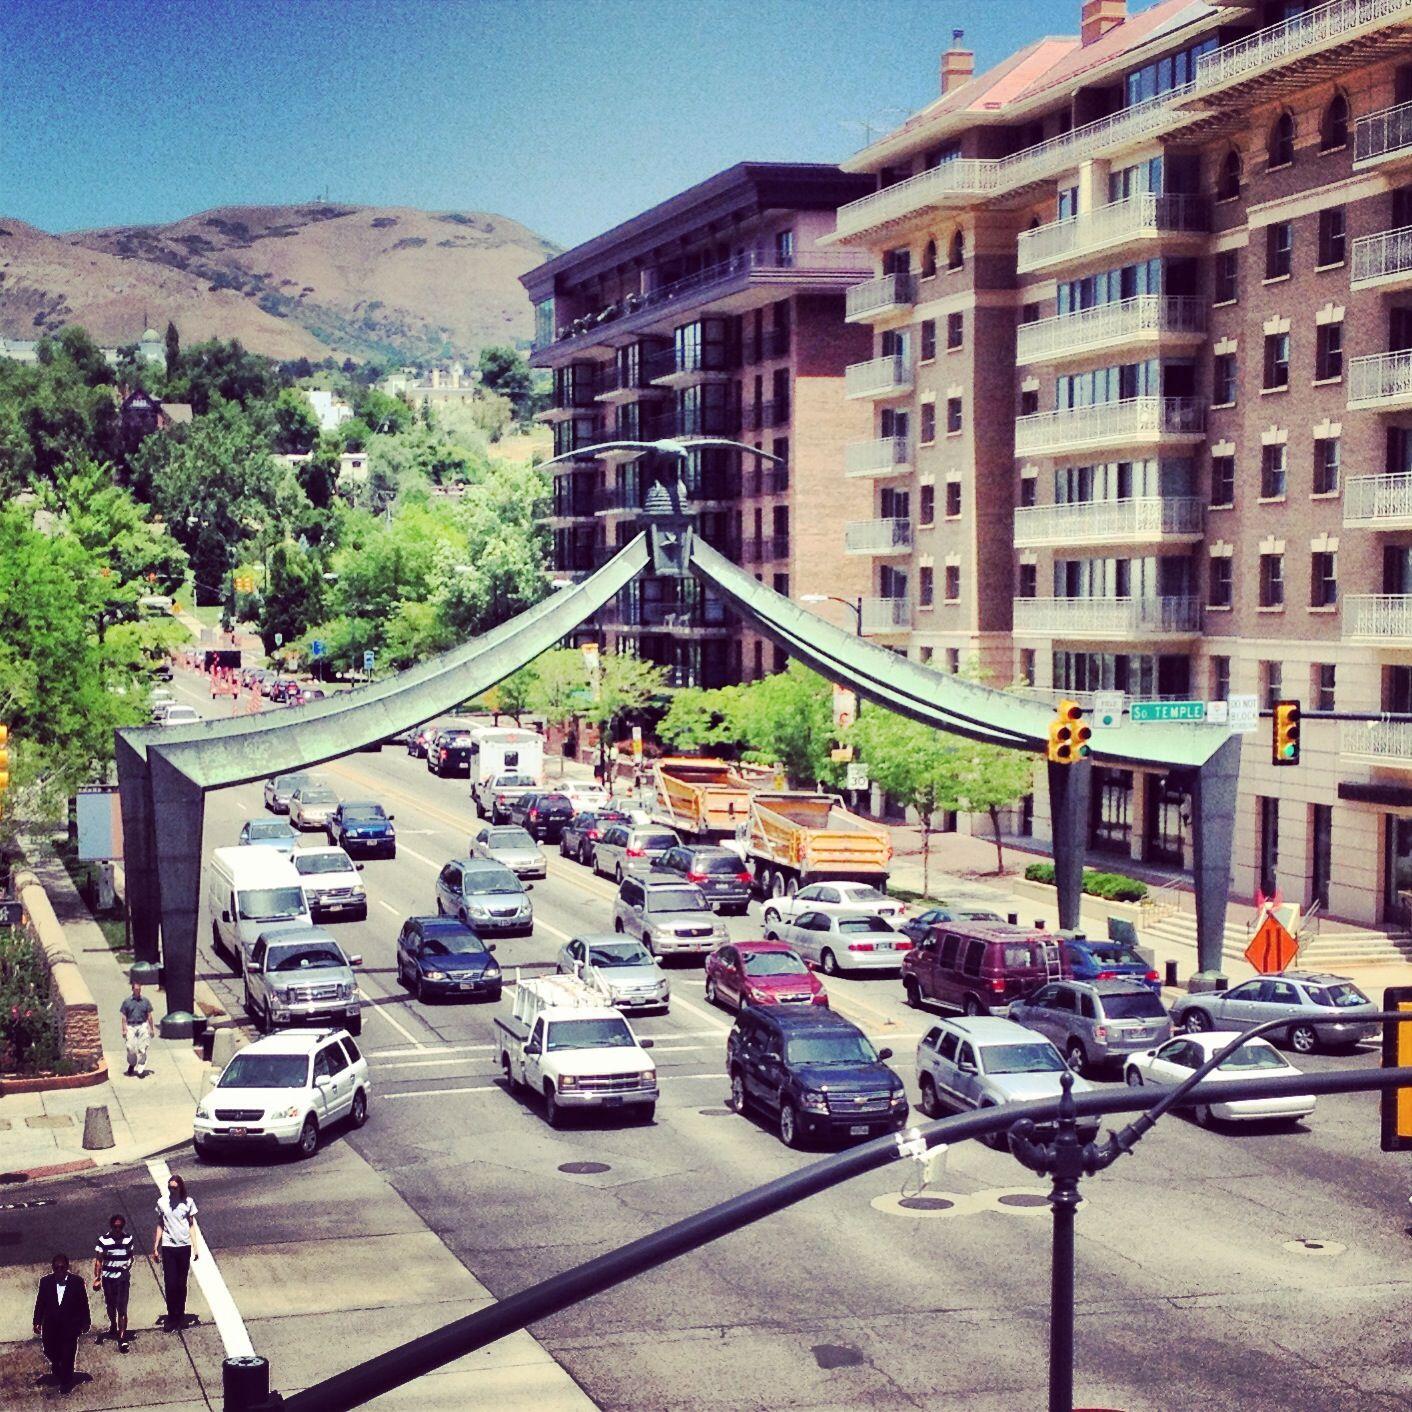 Downtown Salt Lake City Ut: Utah Travel, Salt Lake City Utah